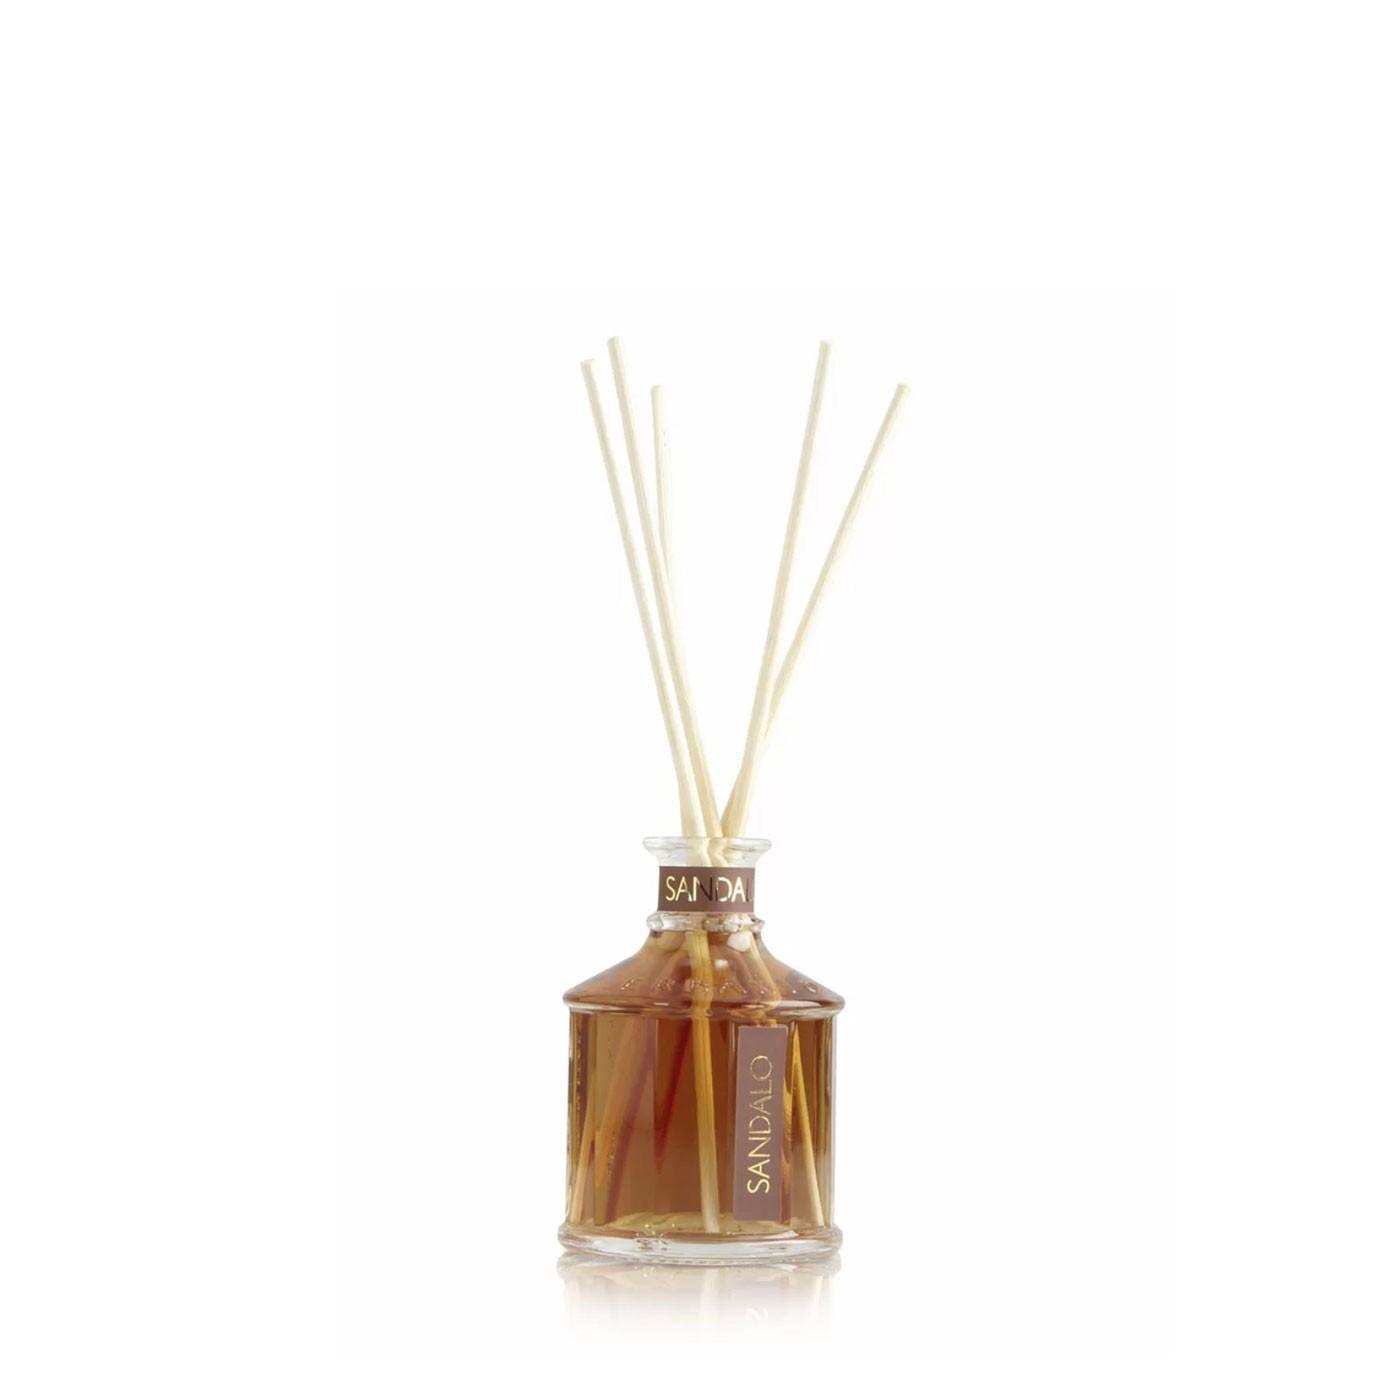 Sandalwood Fragrance Diffuser 3.4 oz